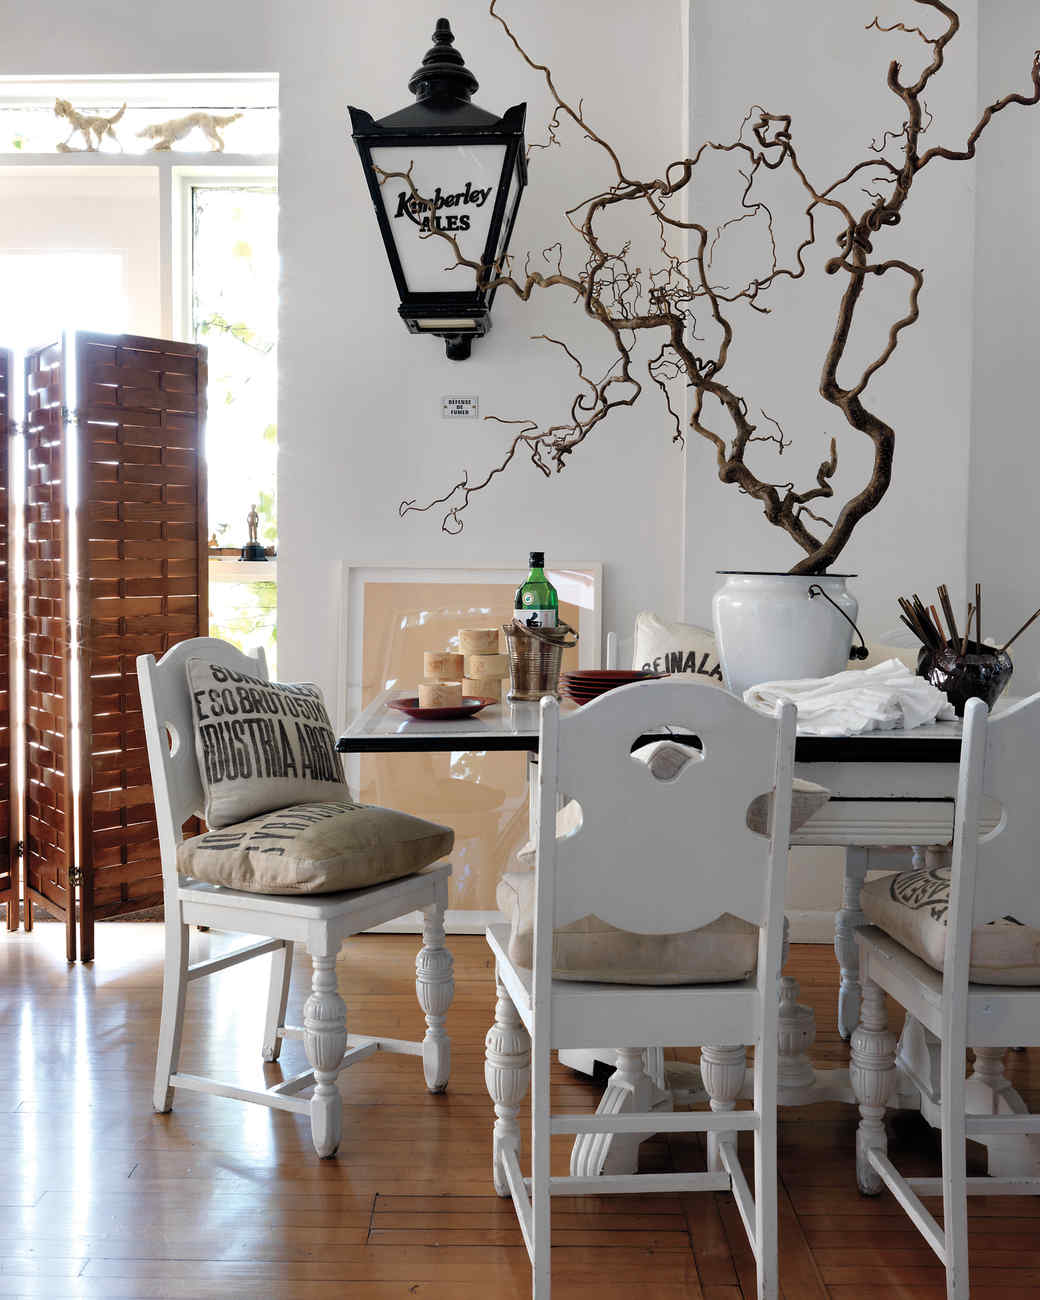 jeffrey-moss-dining-room-mld108945.jpg